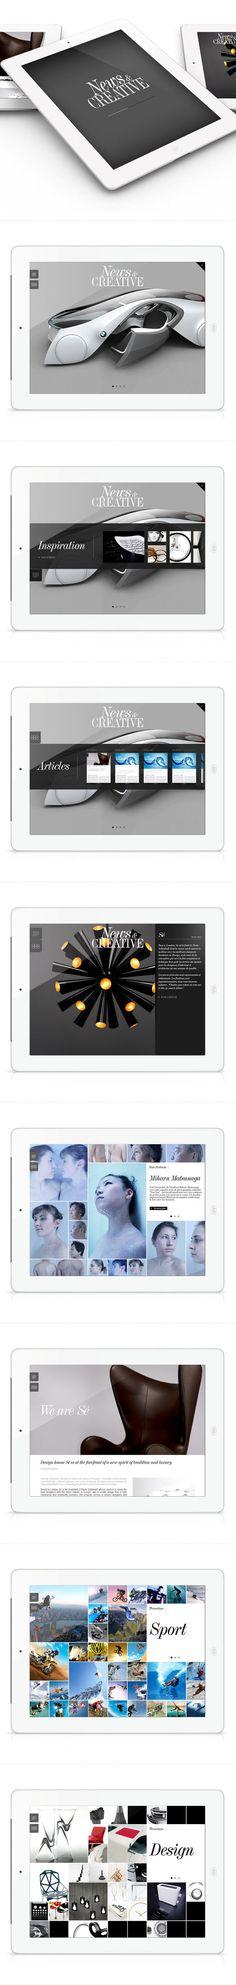 News Creative by Sylvain Weiss, via Behance   ***   Ipad Mag Application